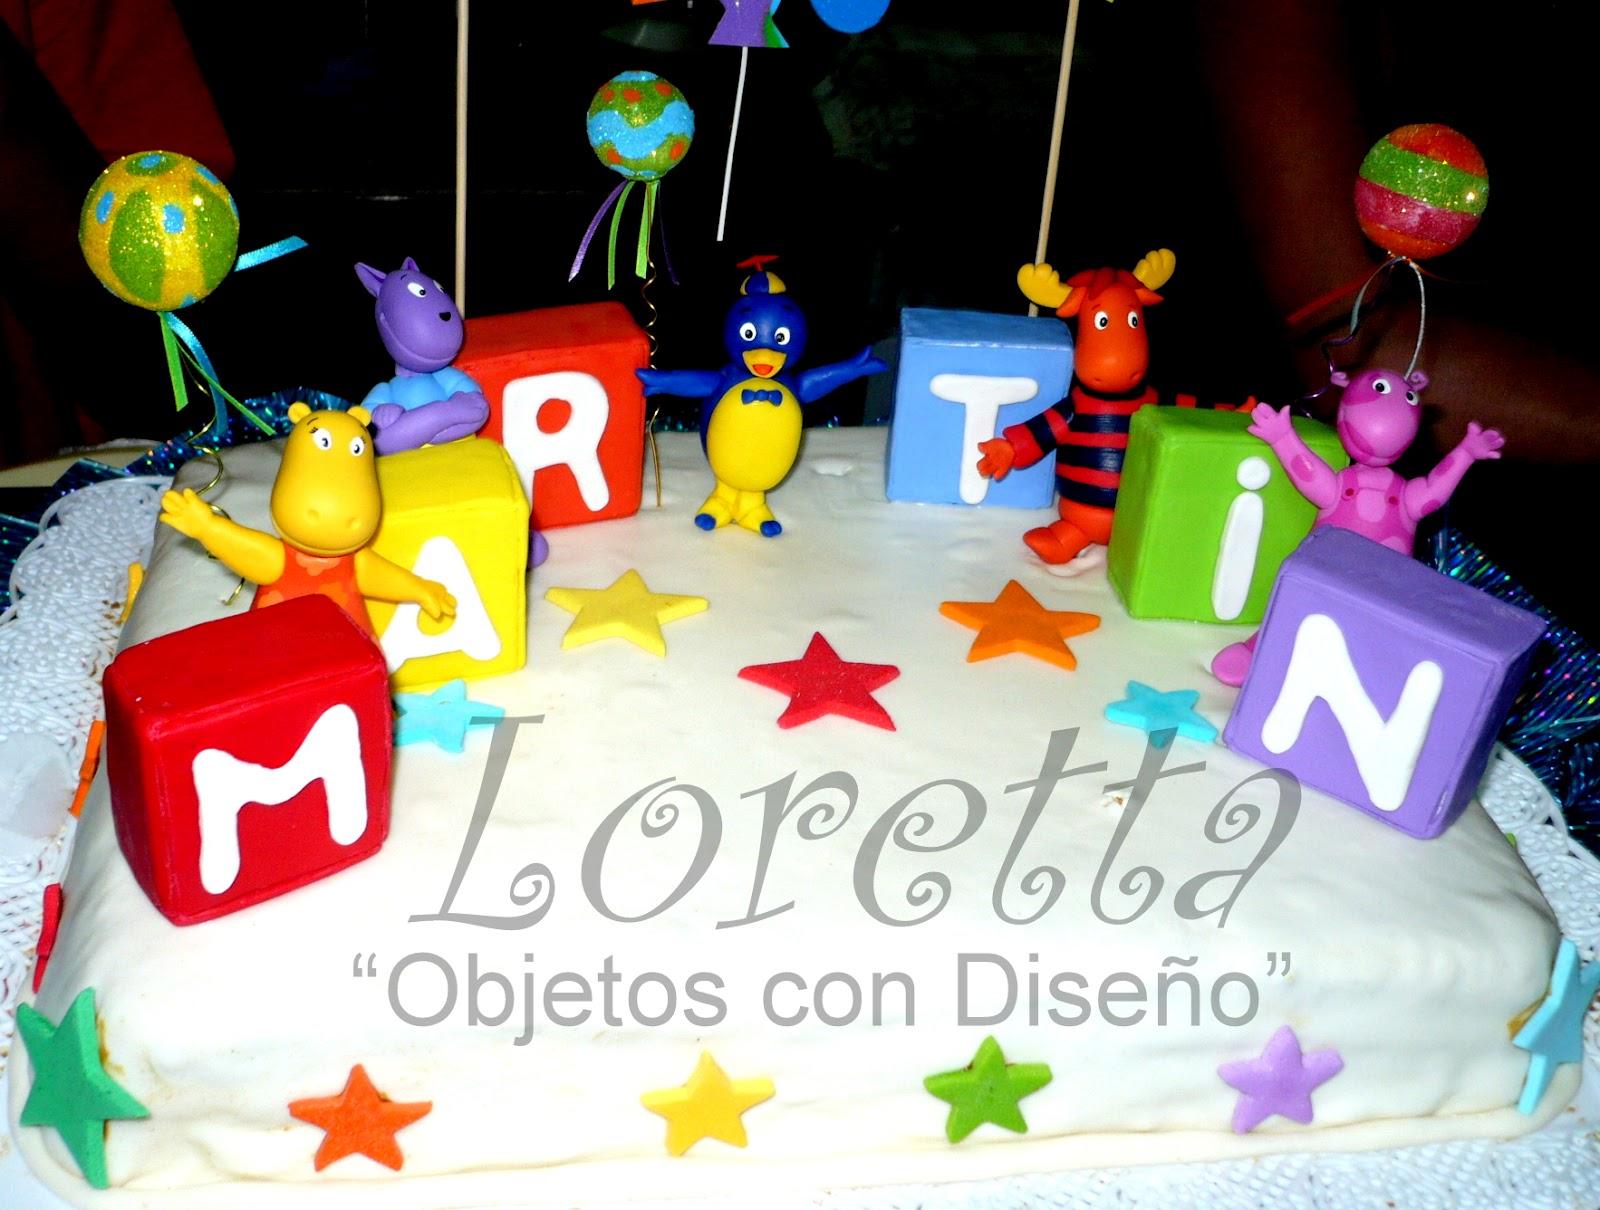 Loretta objetos con dise o decoraci n de bachyardigans - Objetos decoracion diseno ...